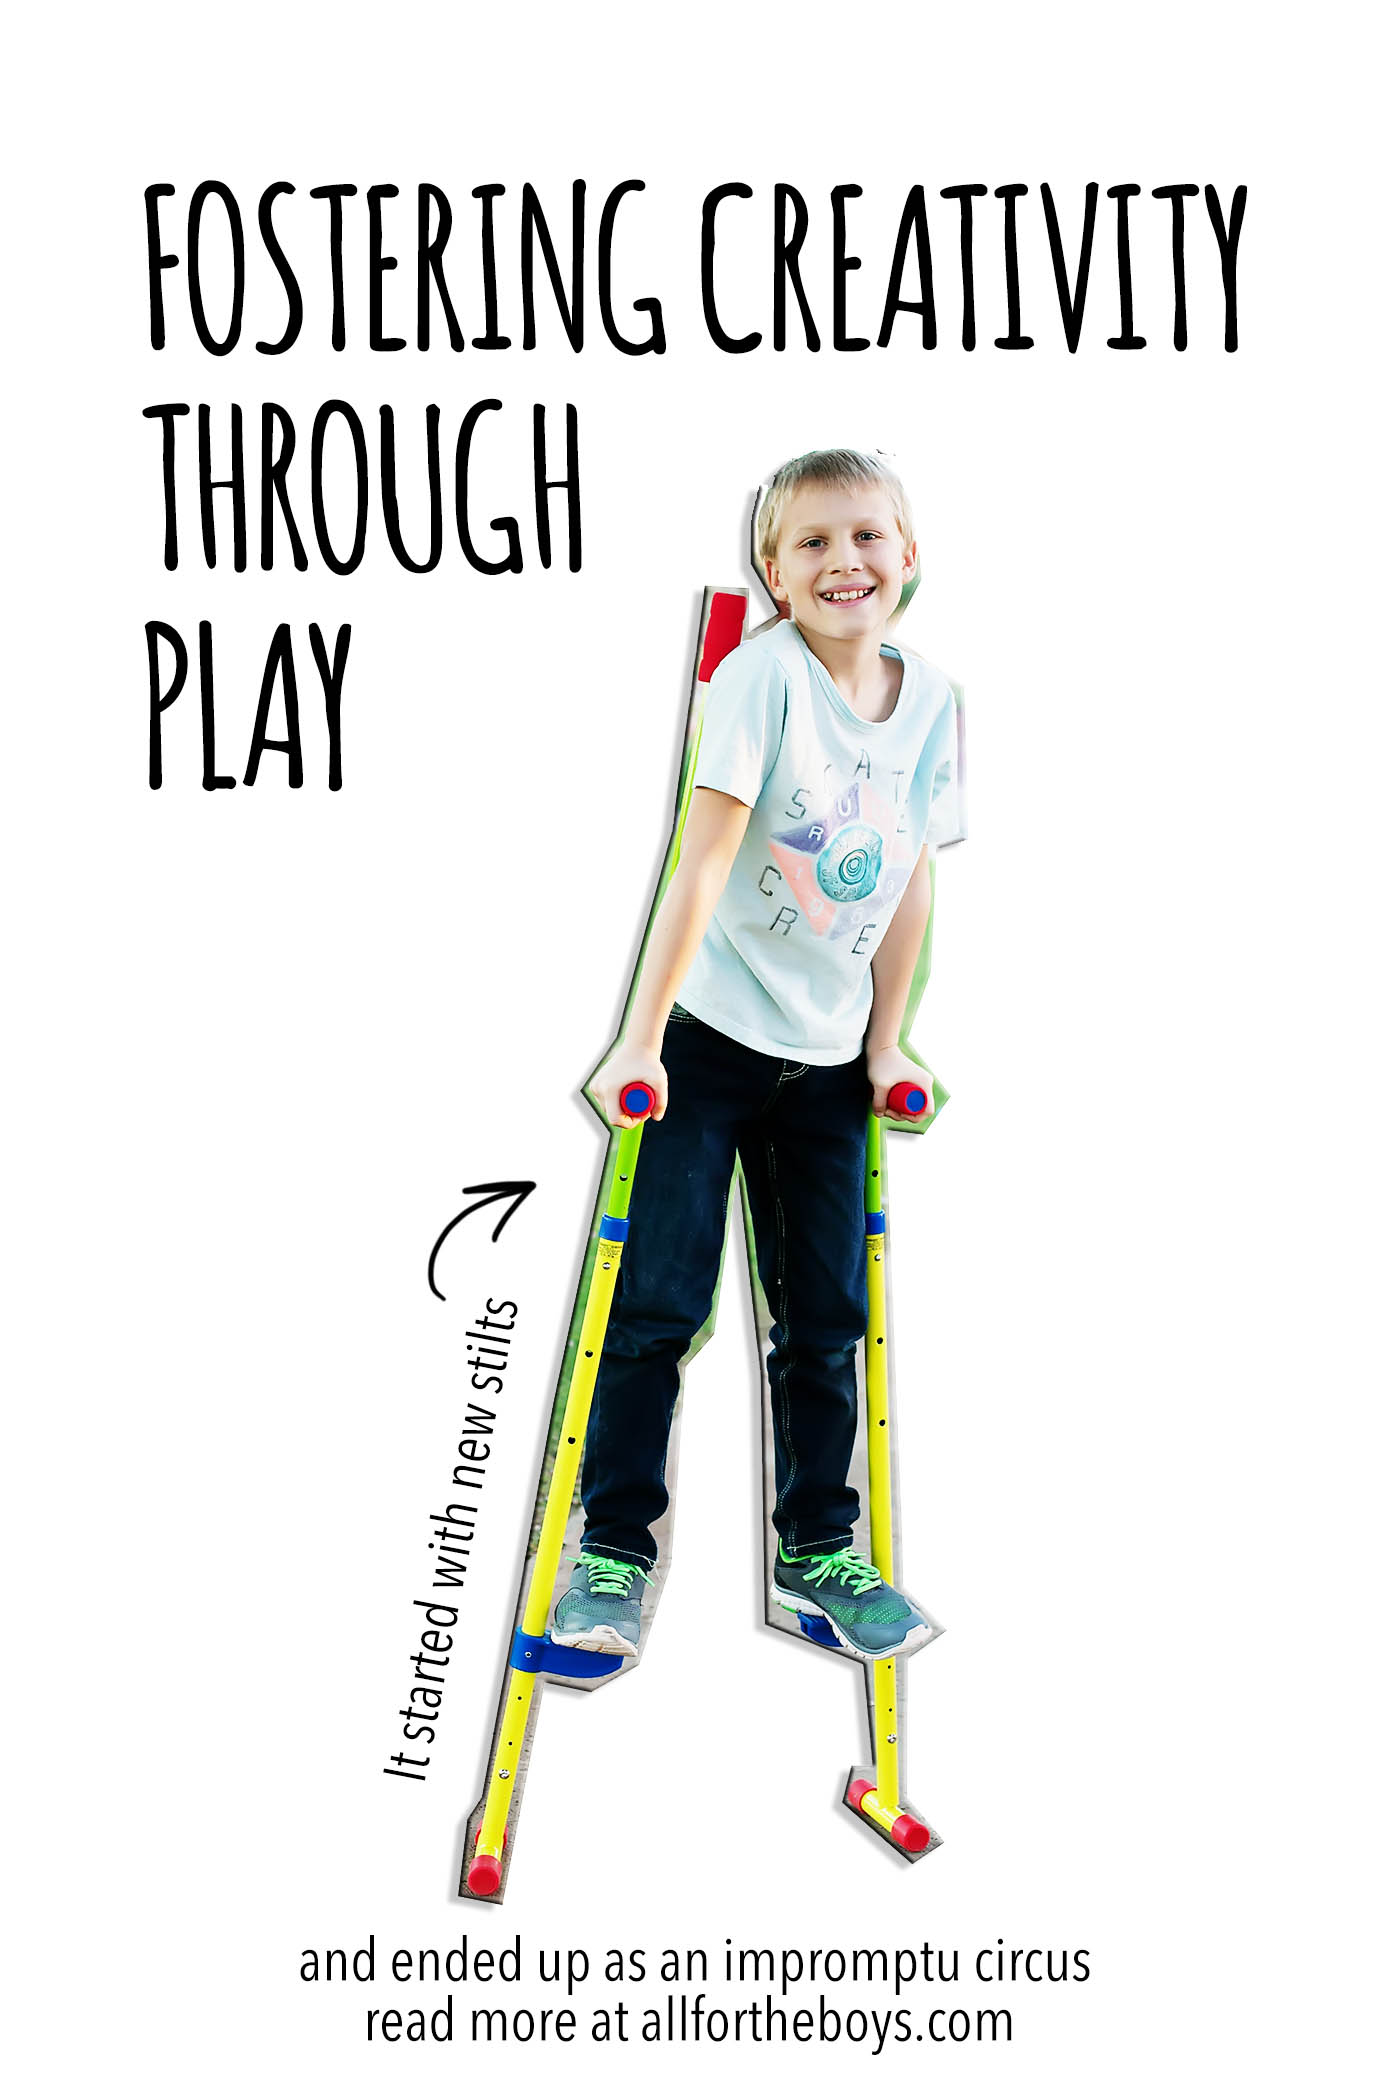 Fostering creativity through play